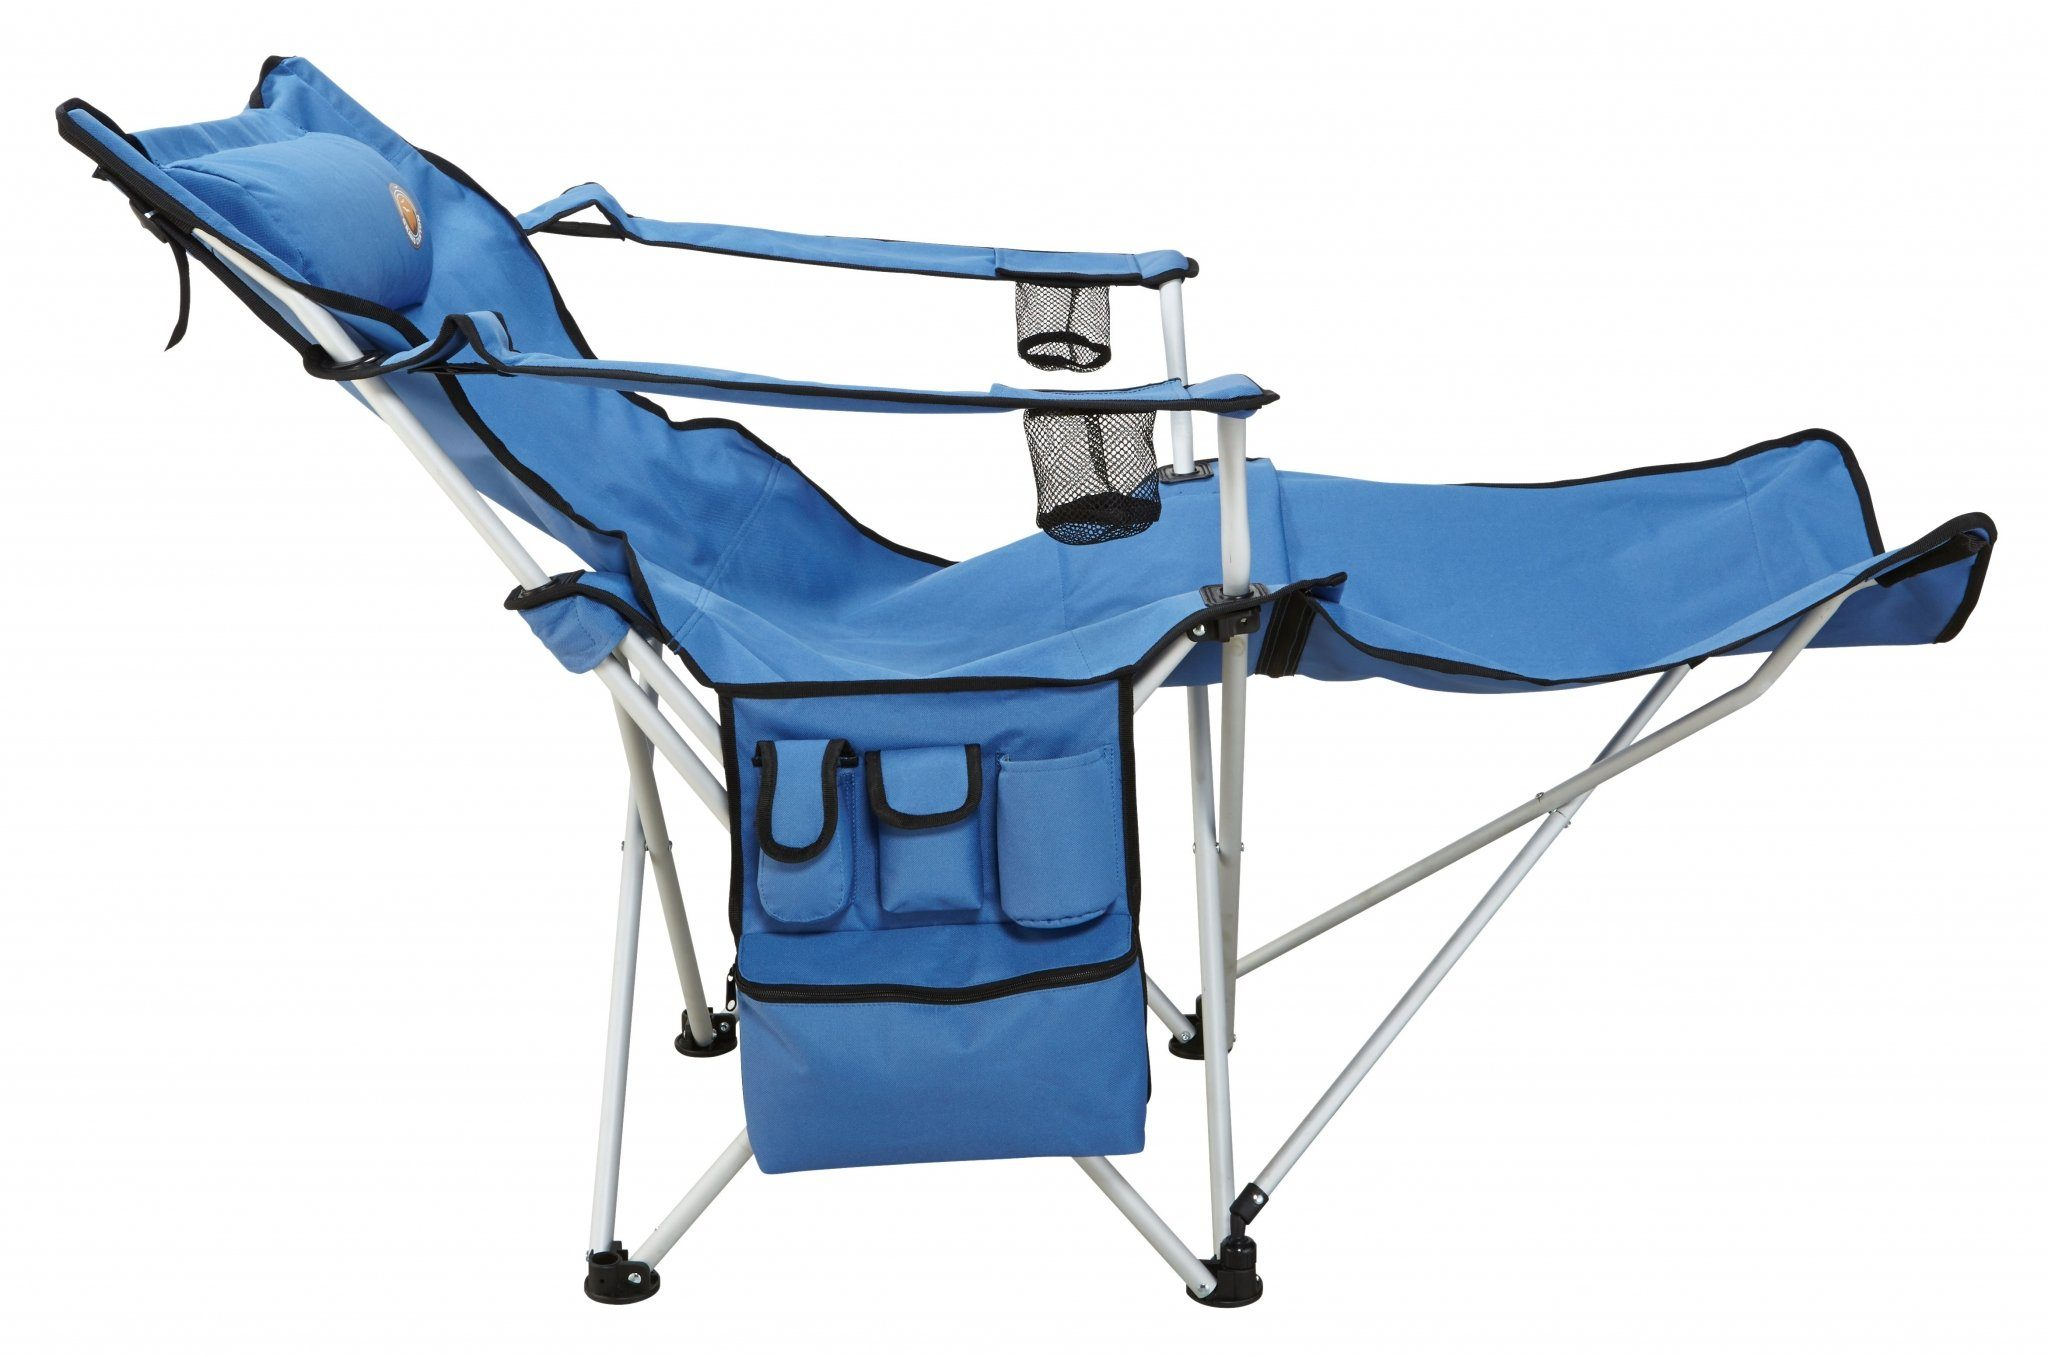 Grand Canyon Camping-Stuhl »Giga Foldable Chair«